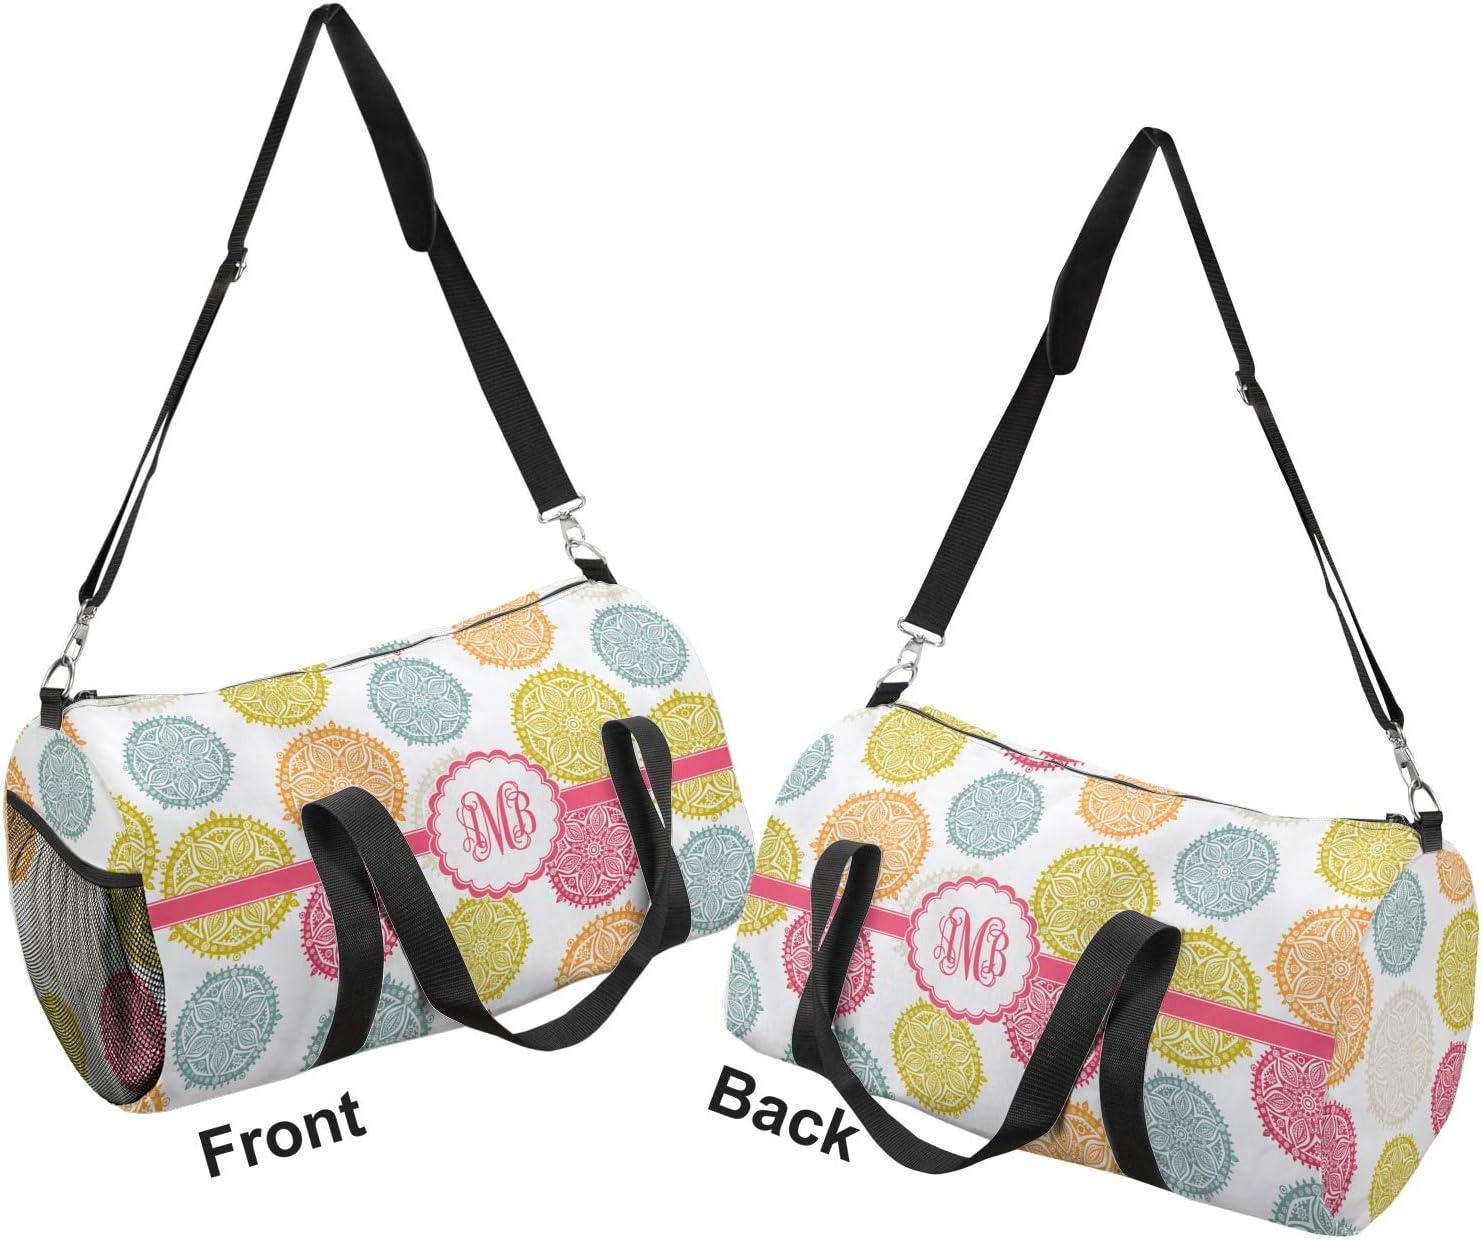 YouCustomizeIt Doily Pattern Duffel Bag Personalized